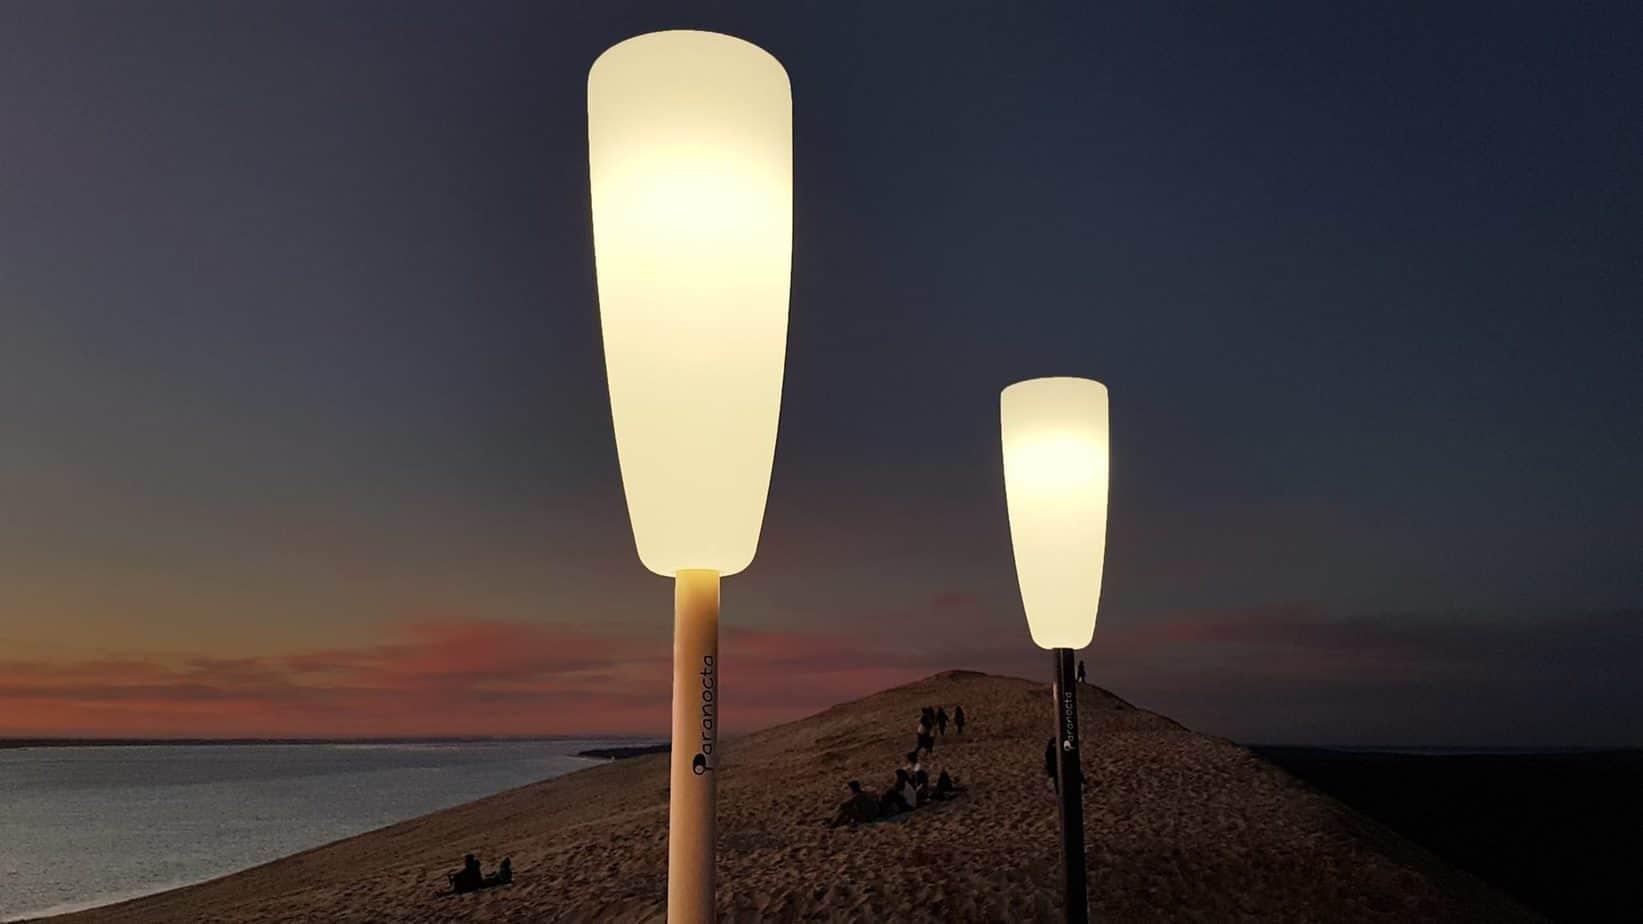 lampadaire paranocta plage